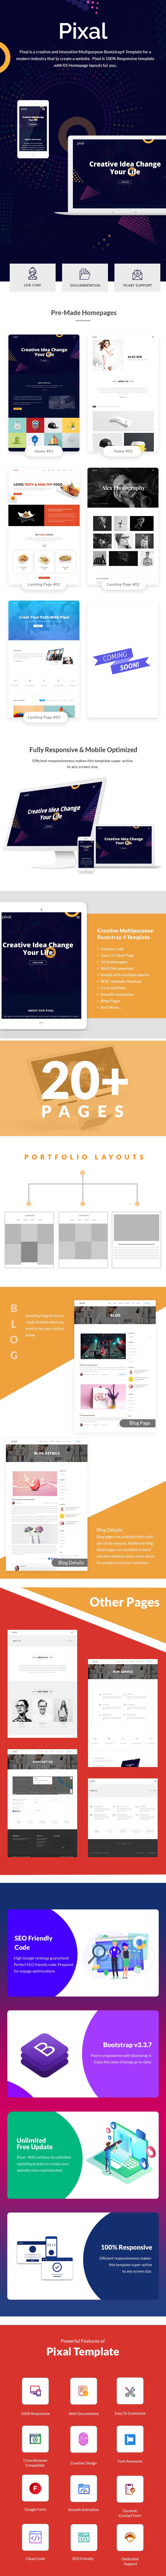 Pixal - Creative Multipurpose Template - 1